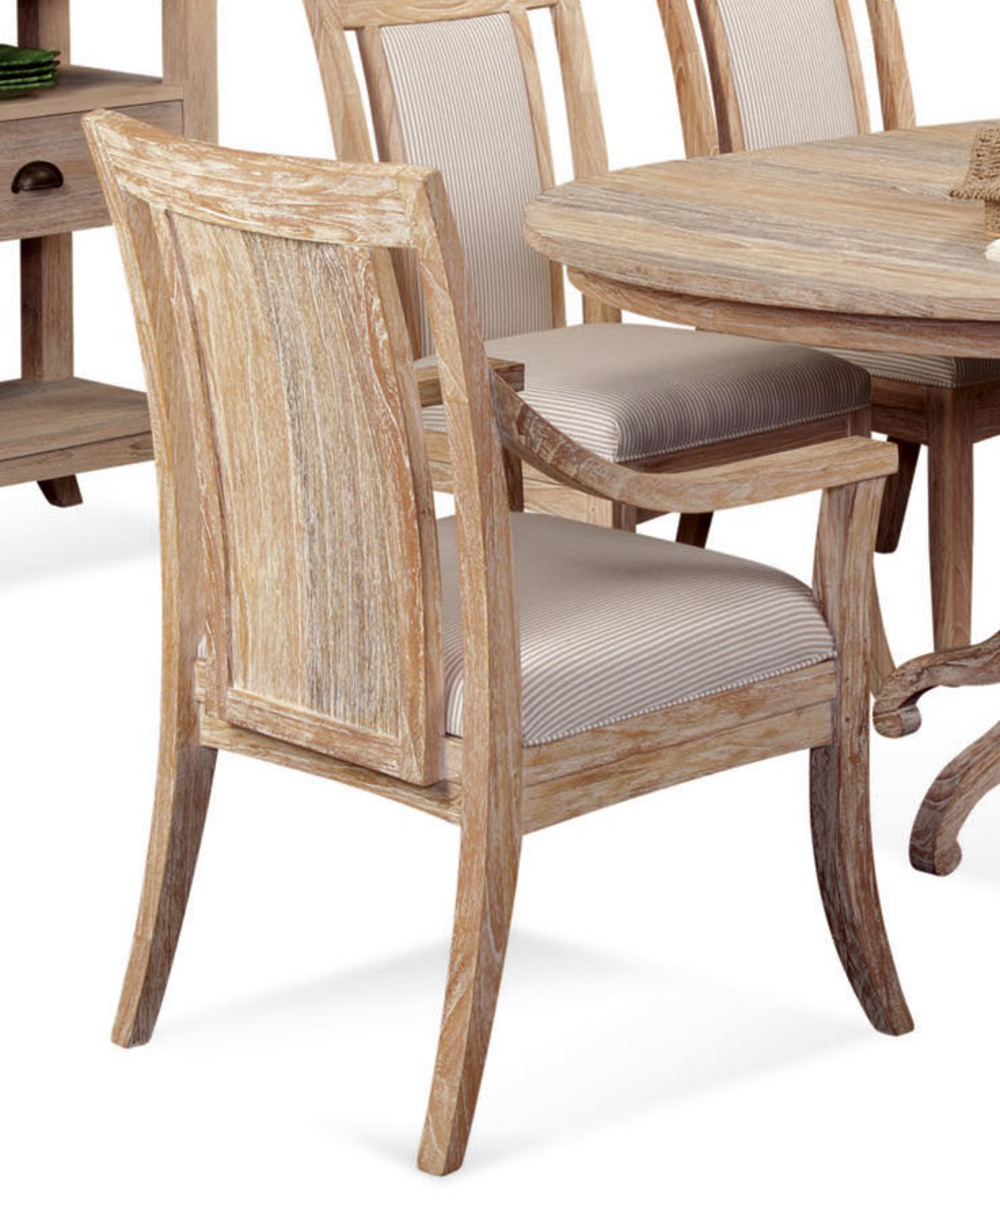 BRAXTON CULLER, INC - Cimarron Arm Chair